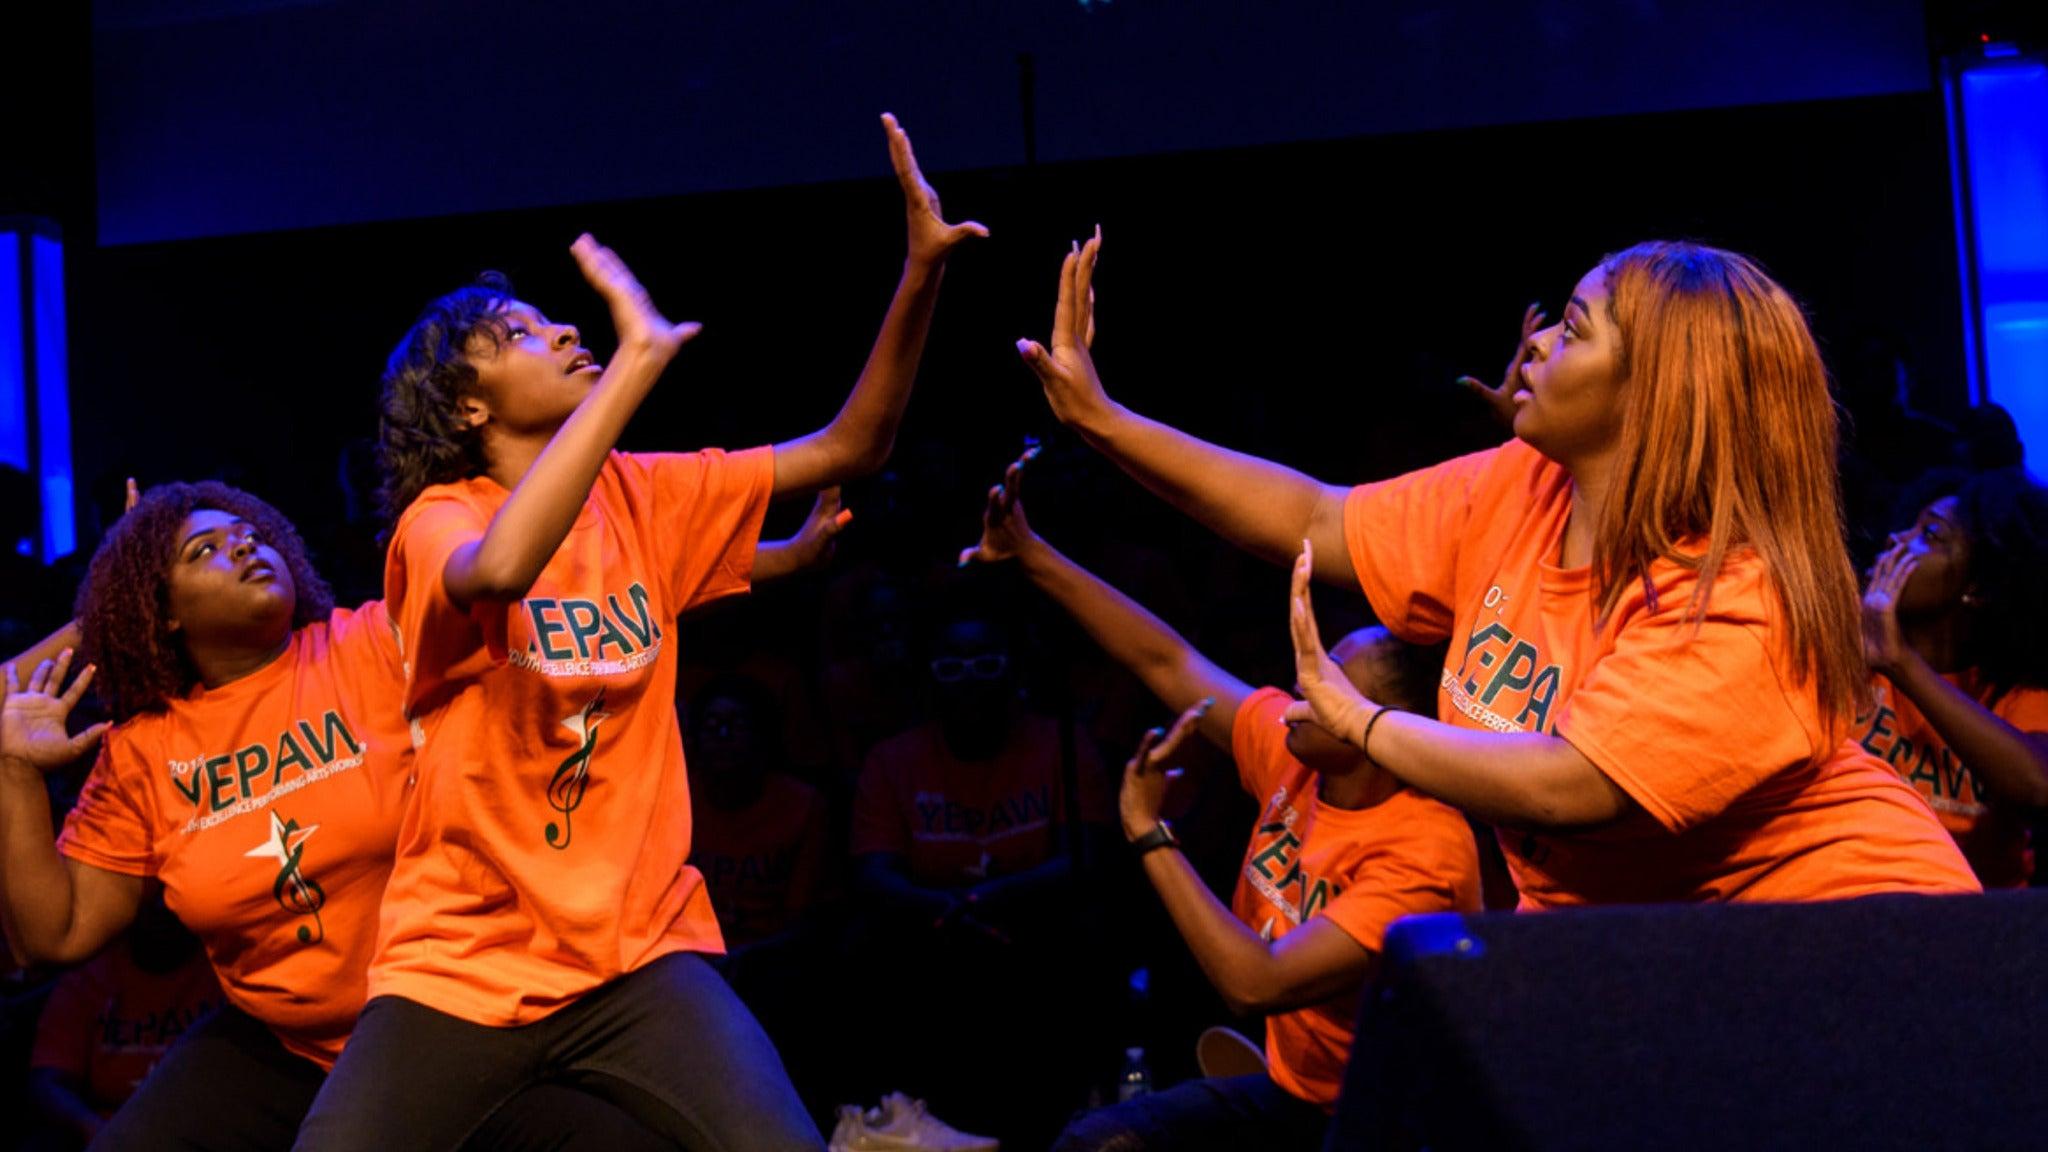 Soulcapella at E.J. Thomas Hall - The University of Akron